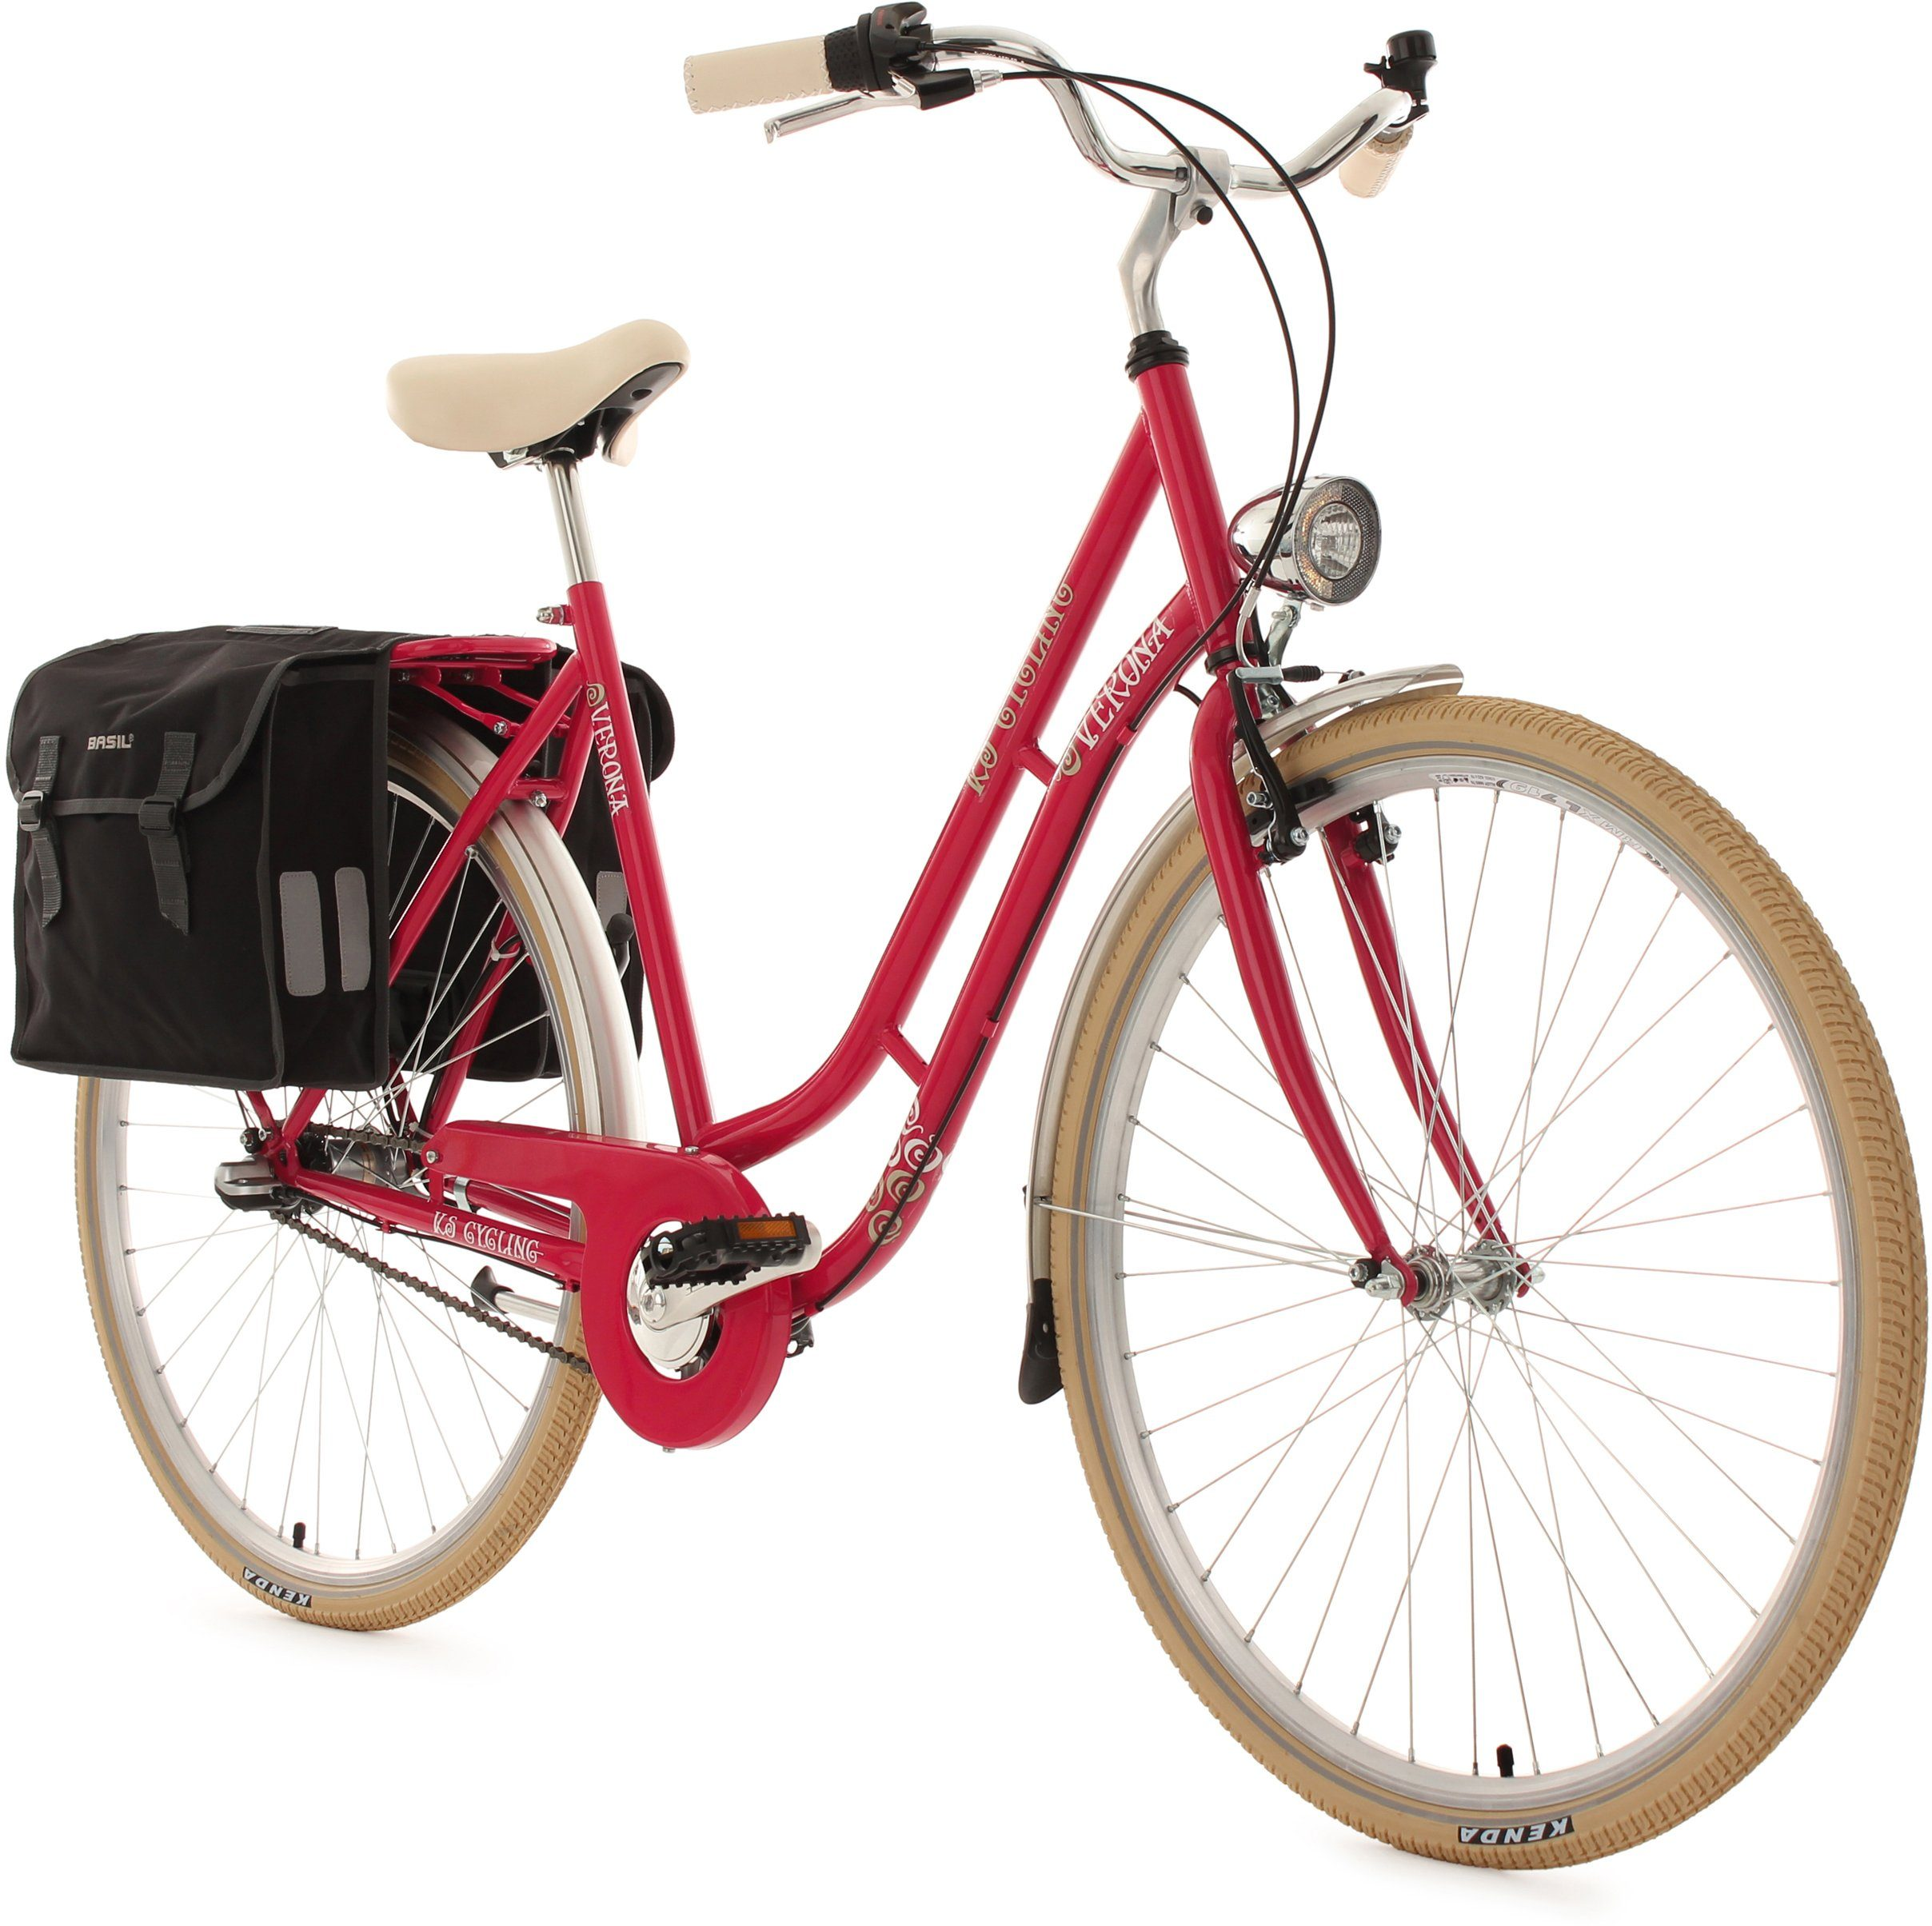 KS Cycling Damen-Cityrad, 28 Zoll, 3 Gang Shimano Nexus, inkl. Doppelpacktasche, »Verona«